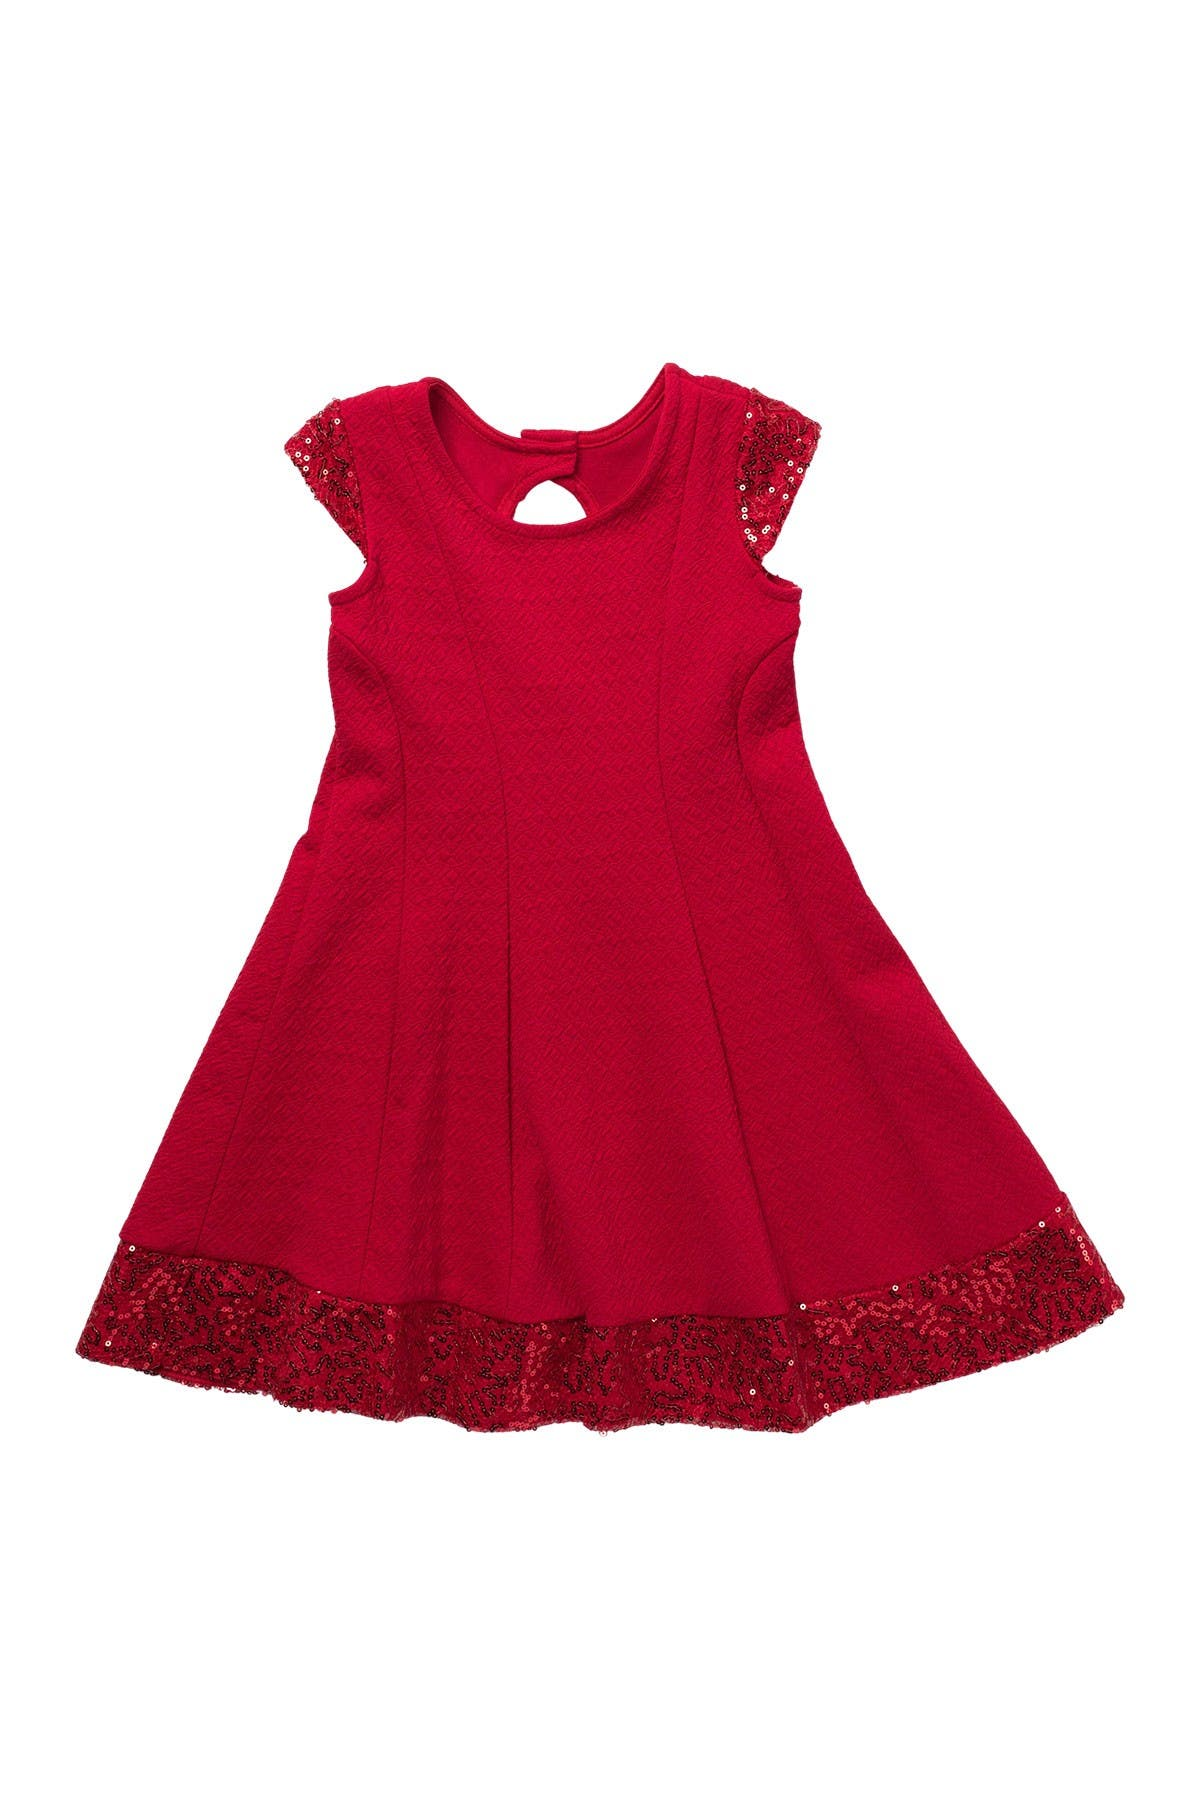 Image of GERSON & GERSON Sequin Knit Skater Dress